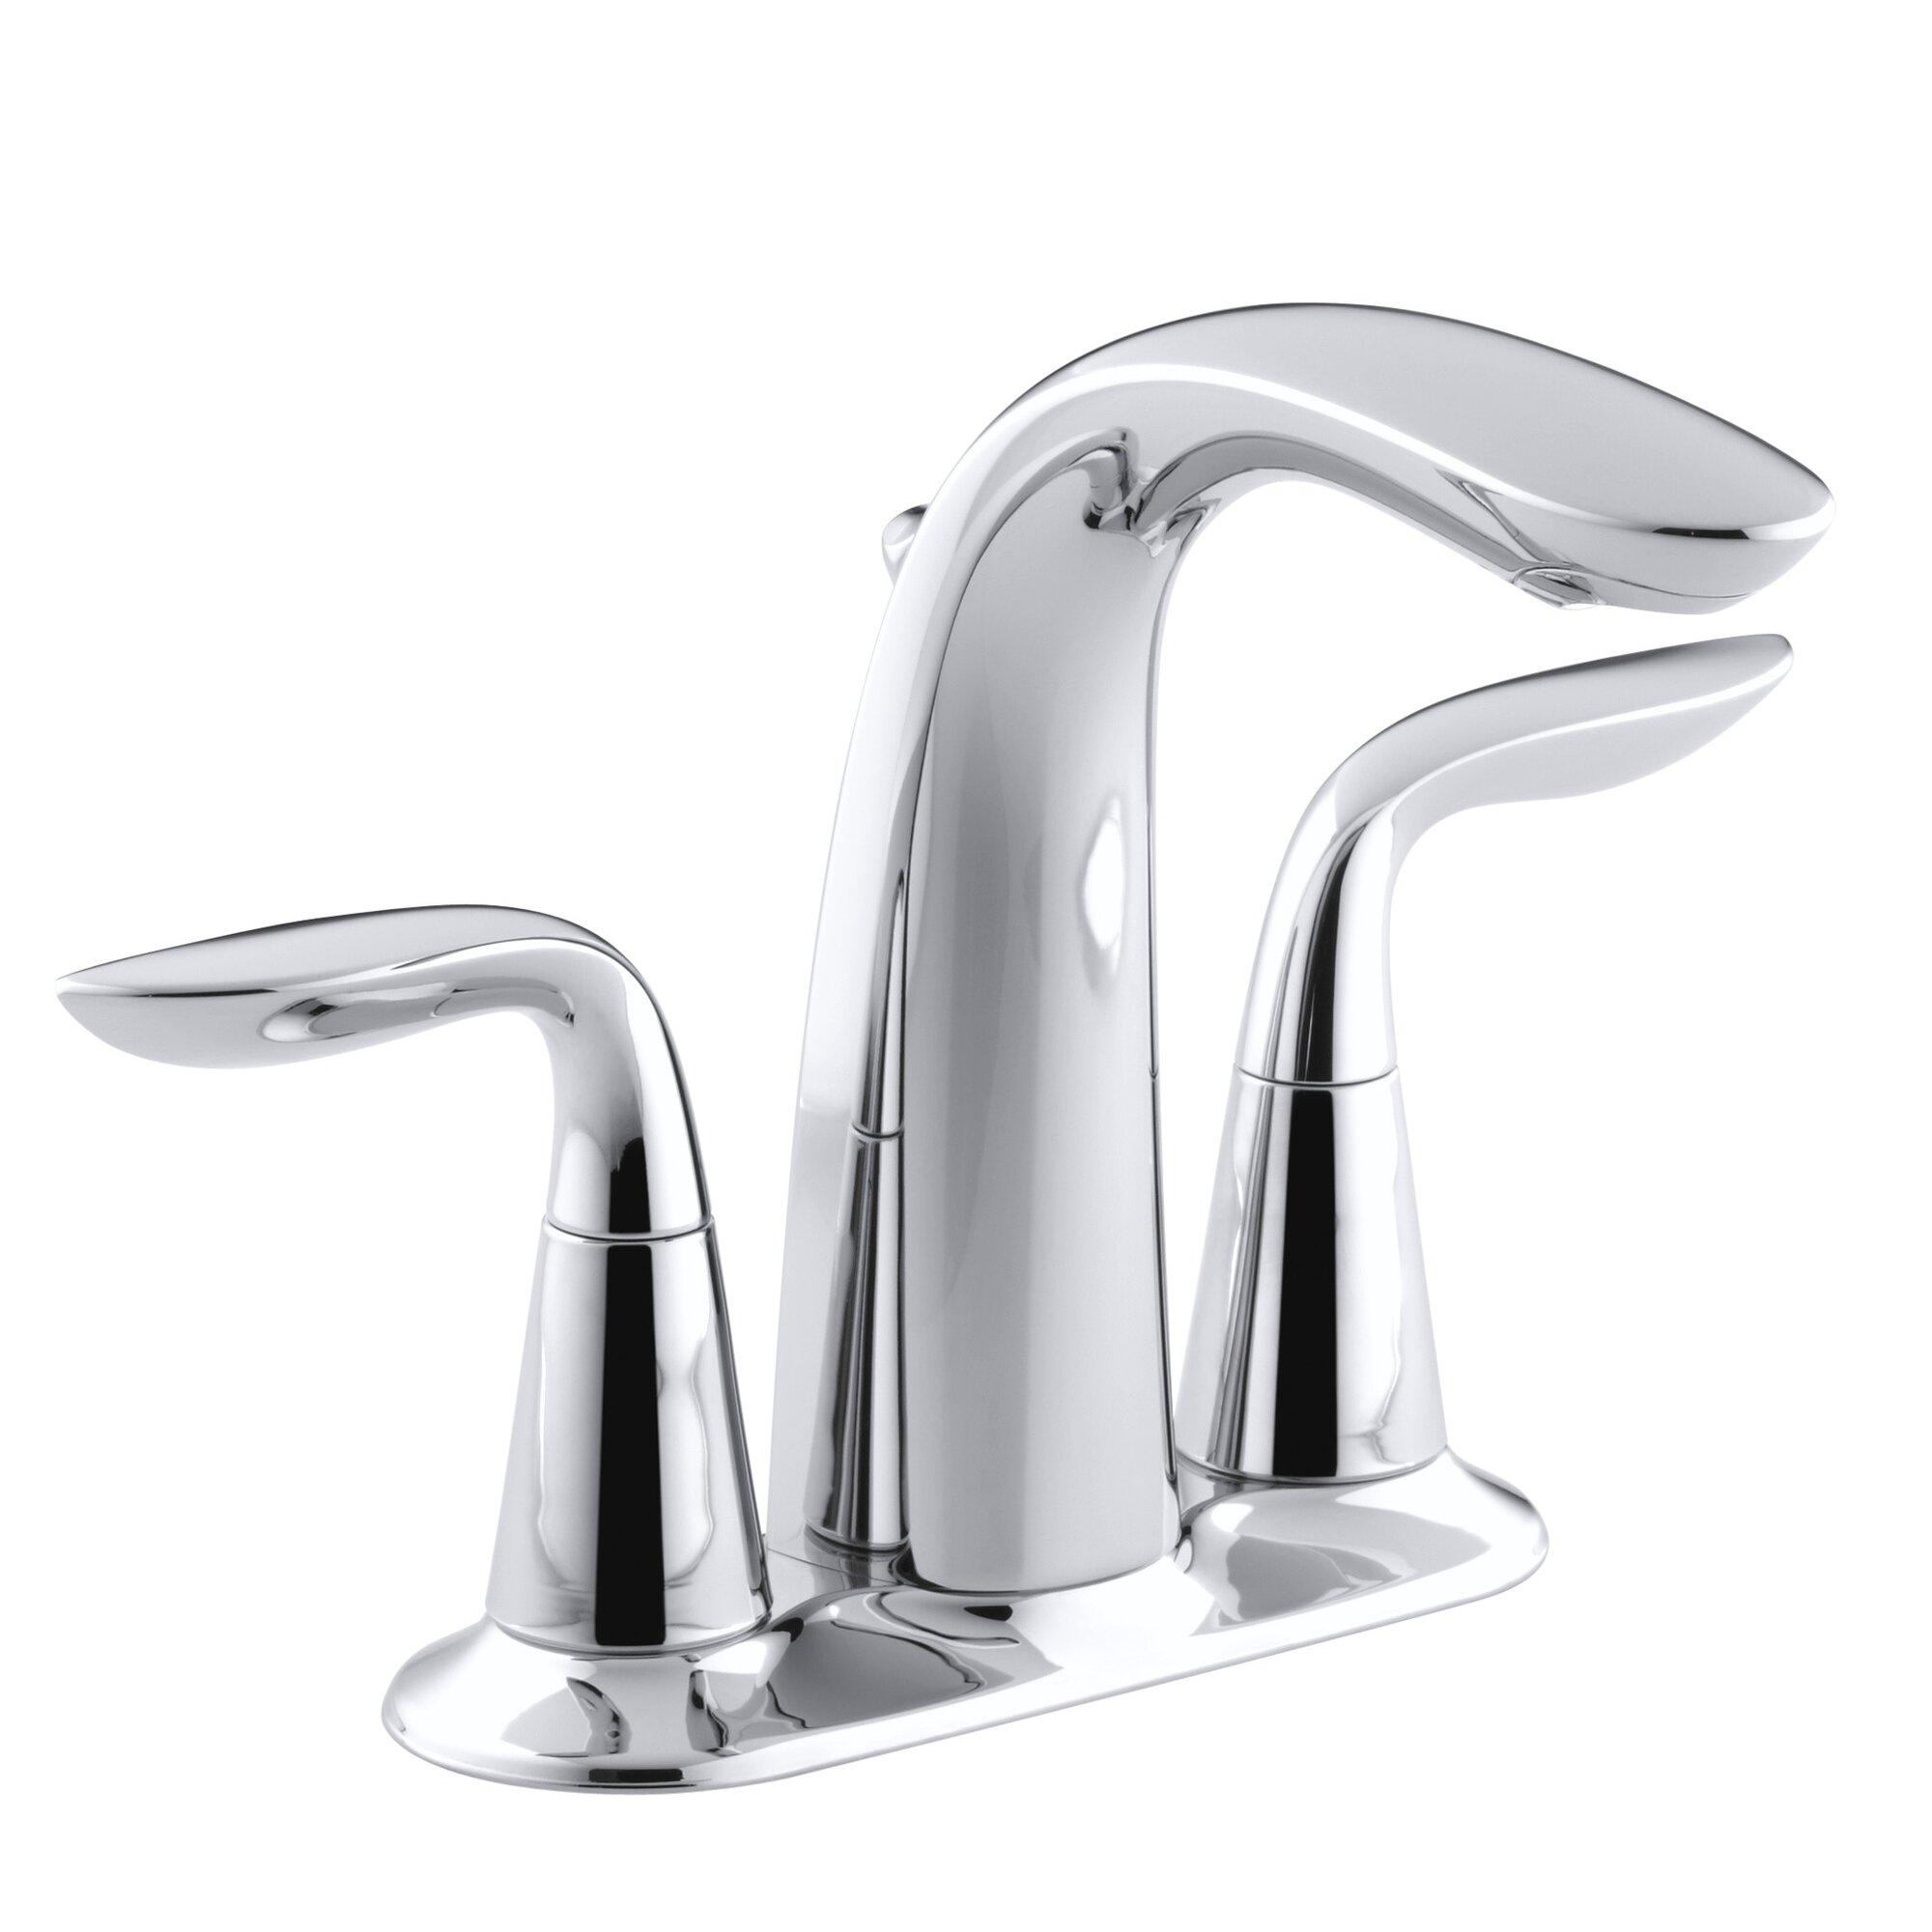 Refinia Centerset Bathroom Sink Faucet